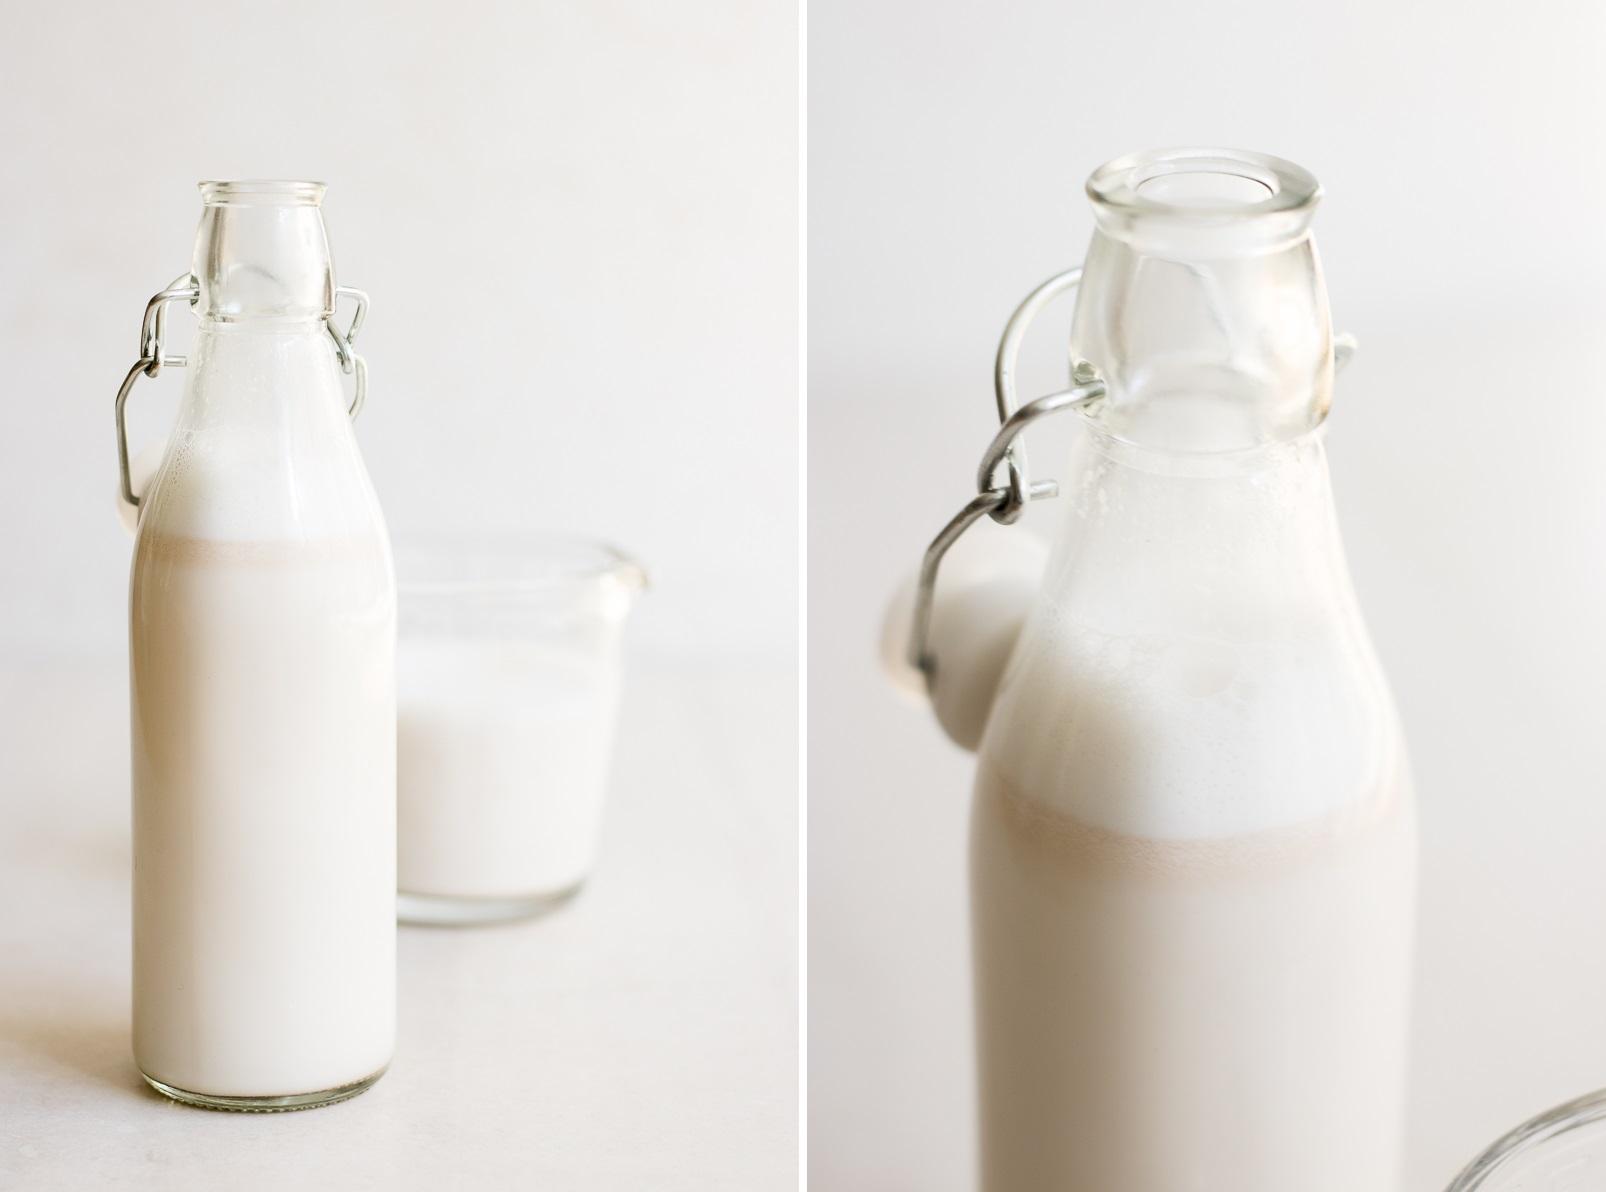 Raw almond milk